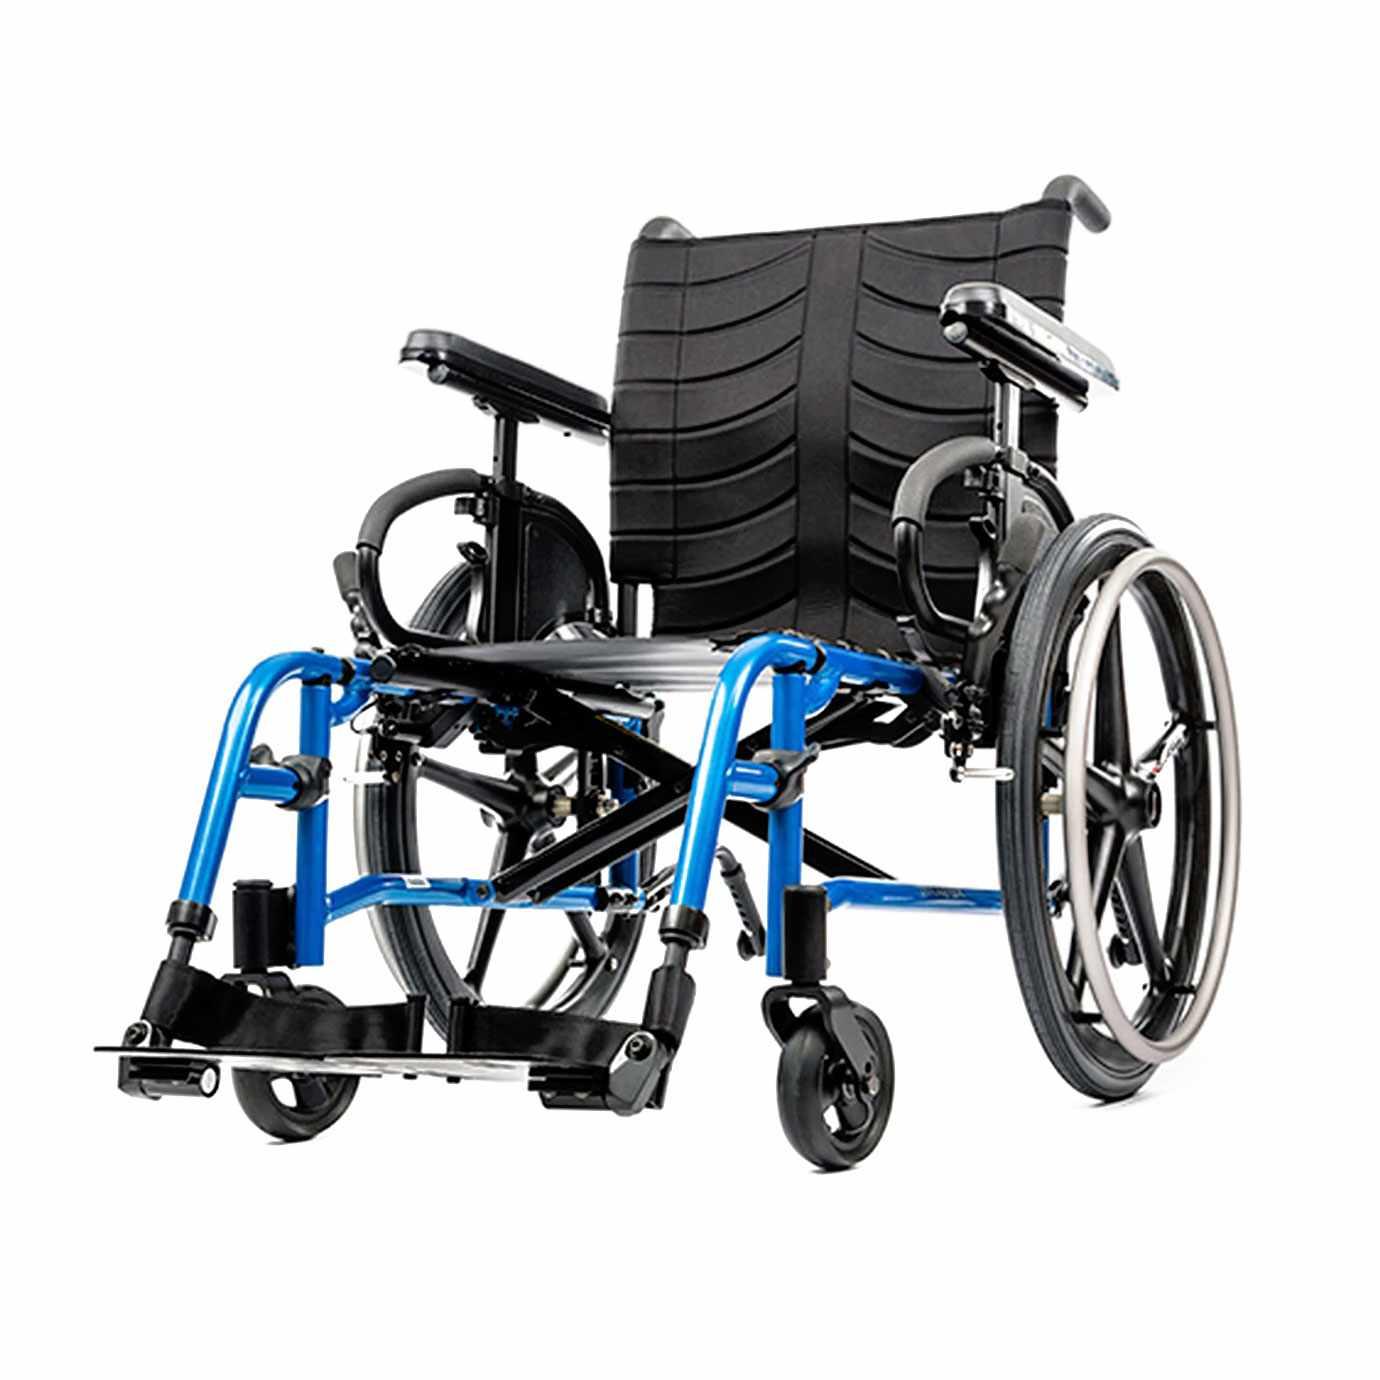 QXi ultra lightweight folding manual wheelchair